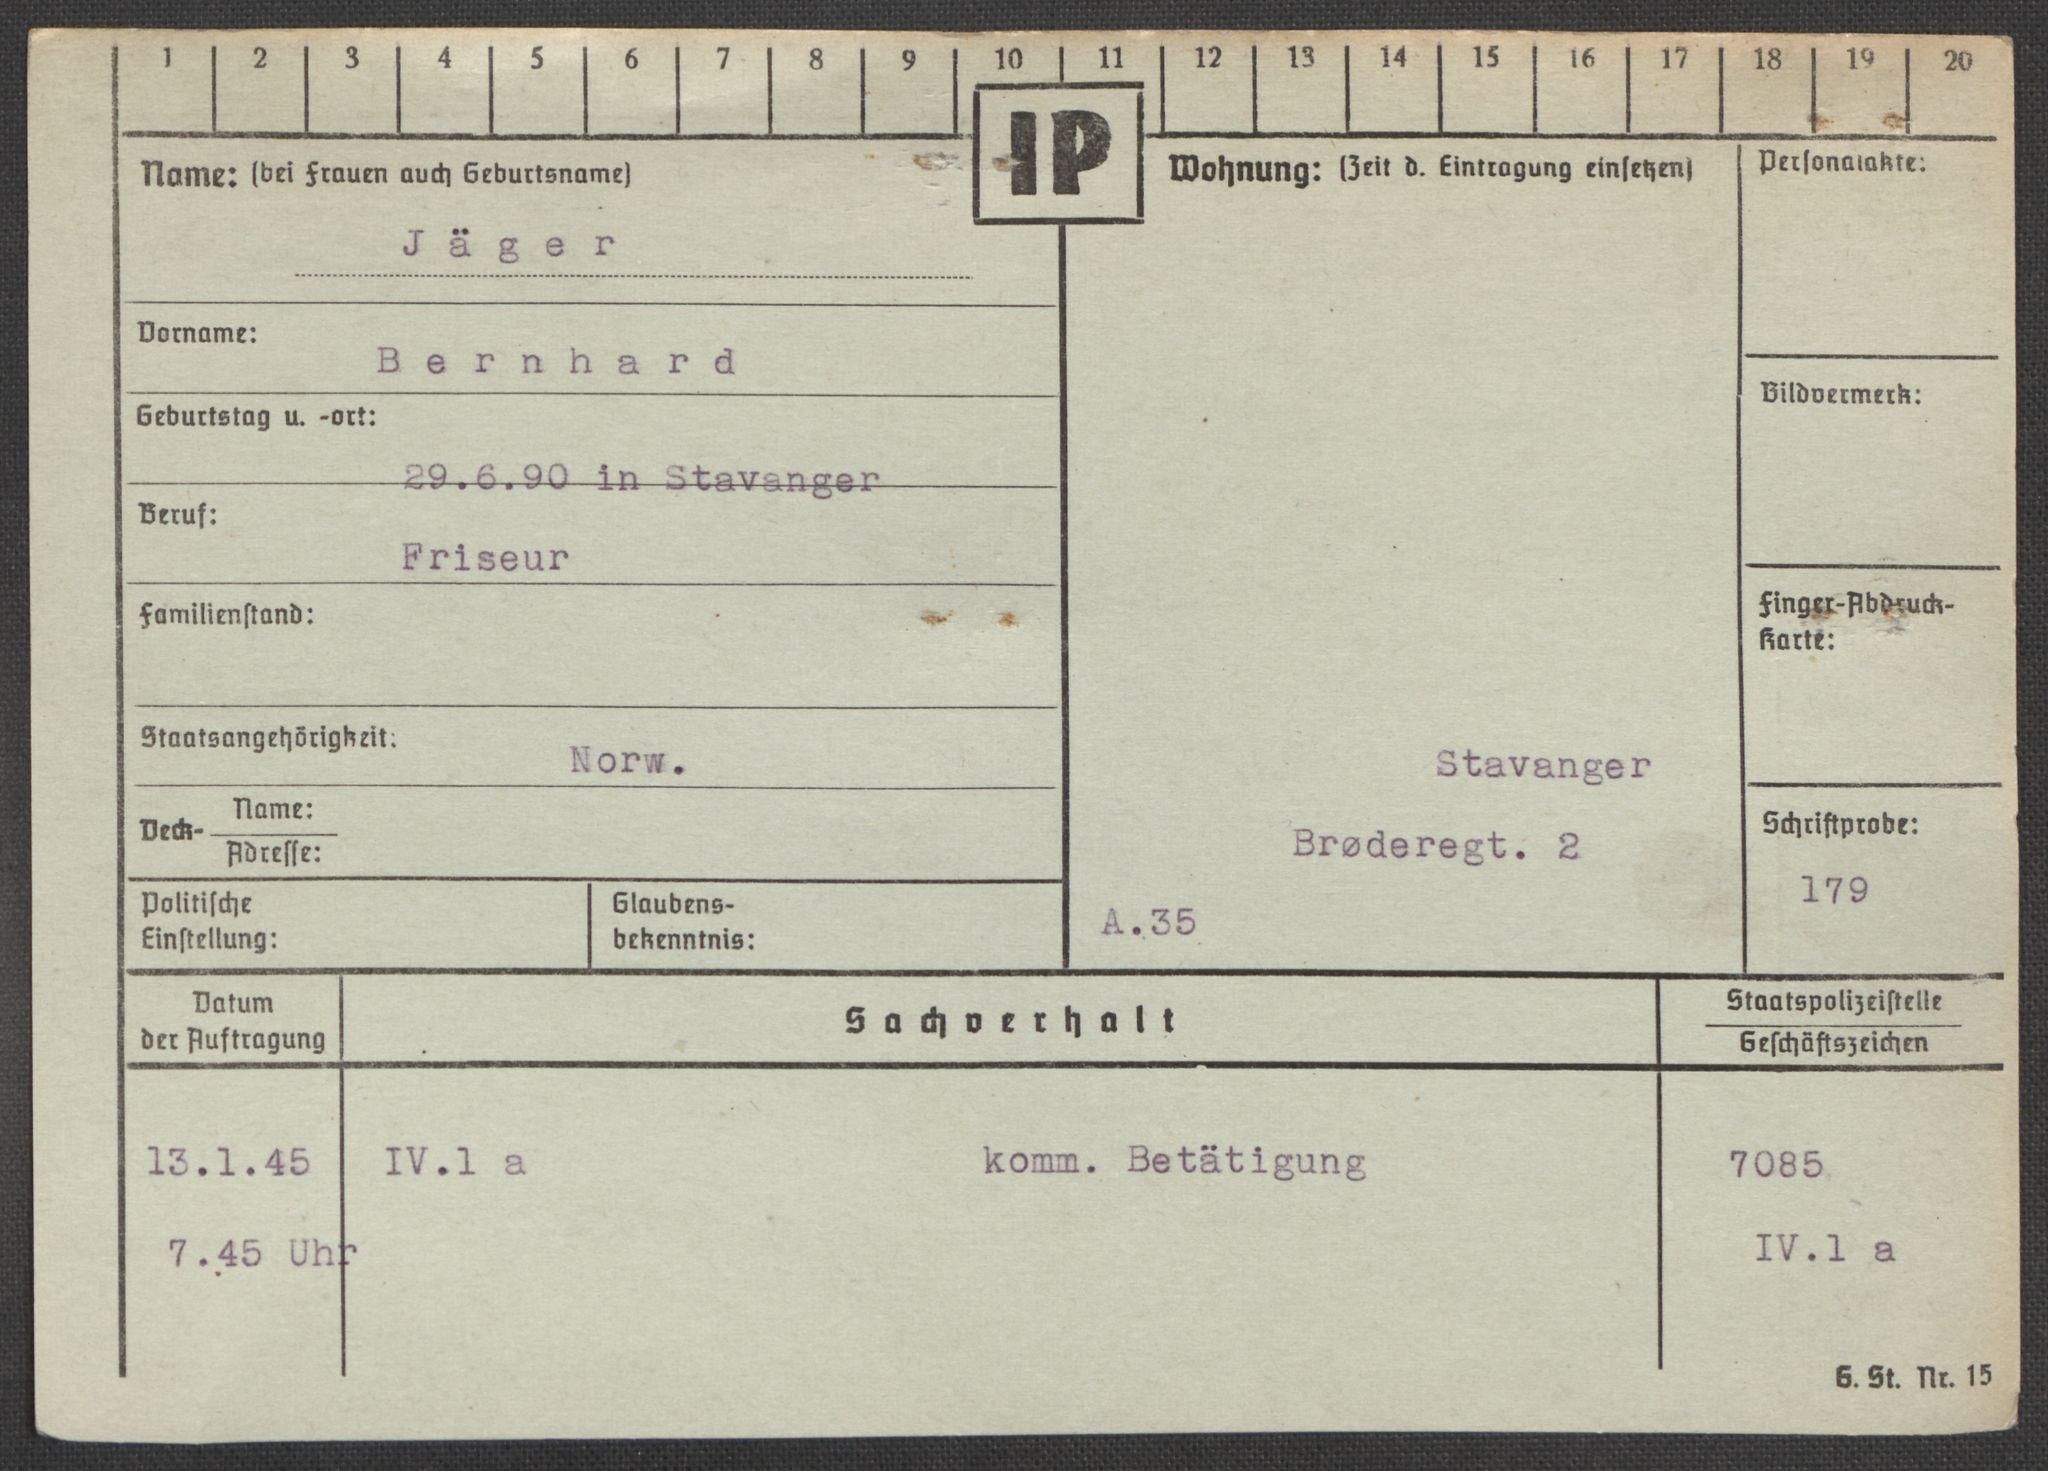 RA, Befehlshaber der Sicherheitspolizei und des SD, E/Ea/Eaa/L0005: Register over norske fanger i Møllergata 19: Hø-Kj, 1940-1945, s. 1073